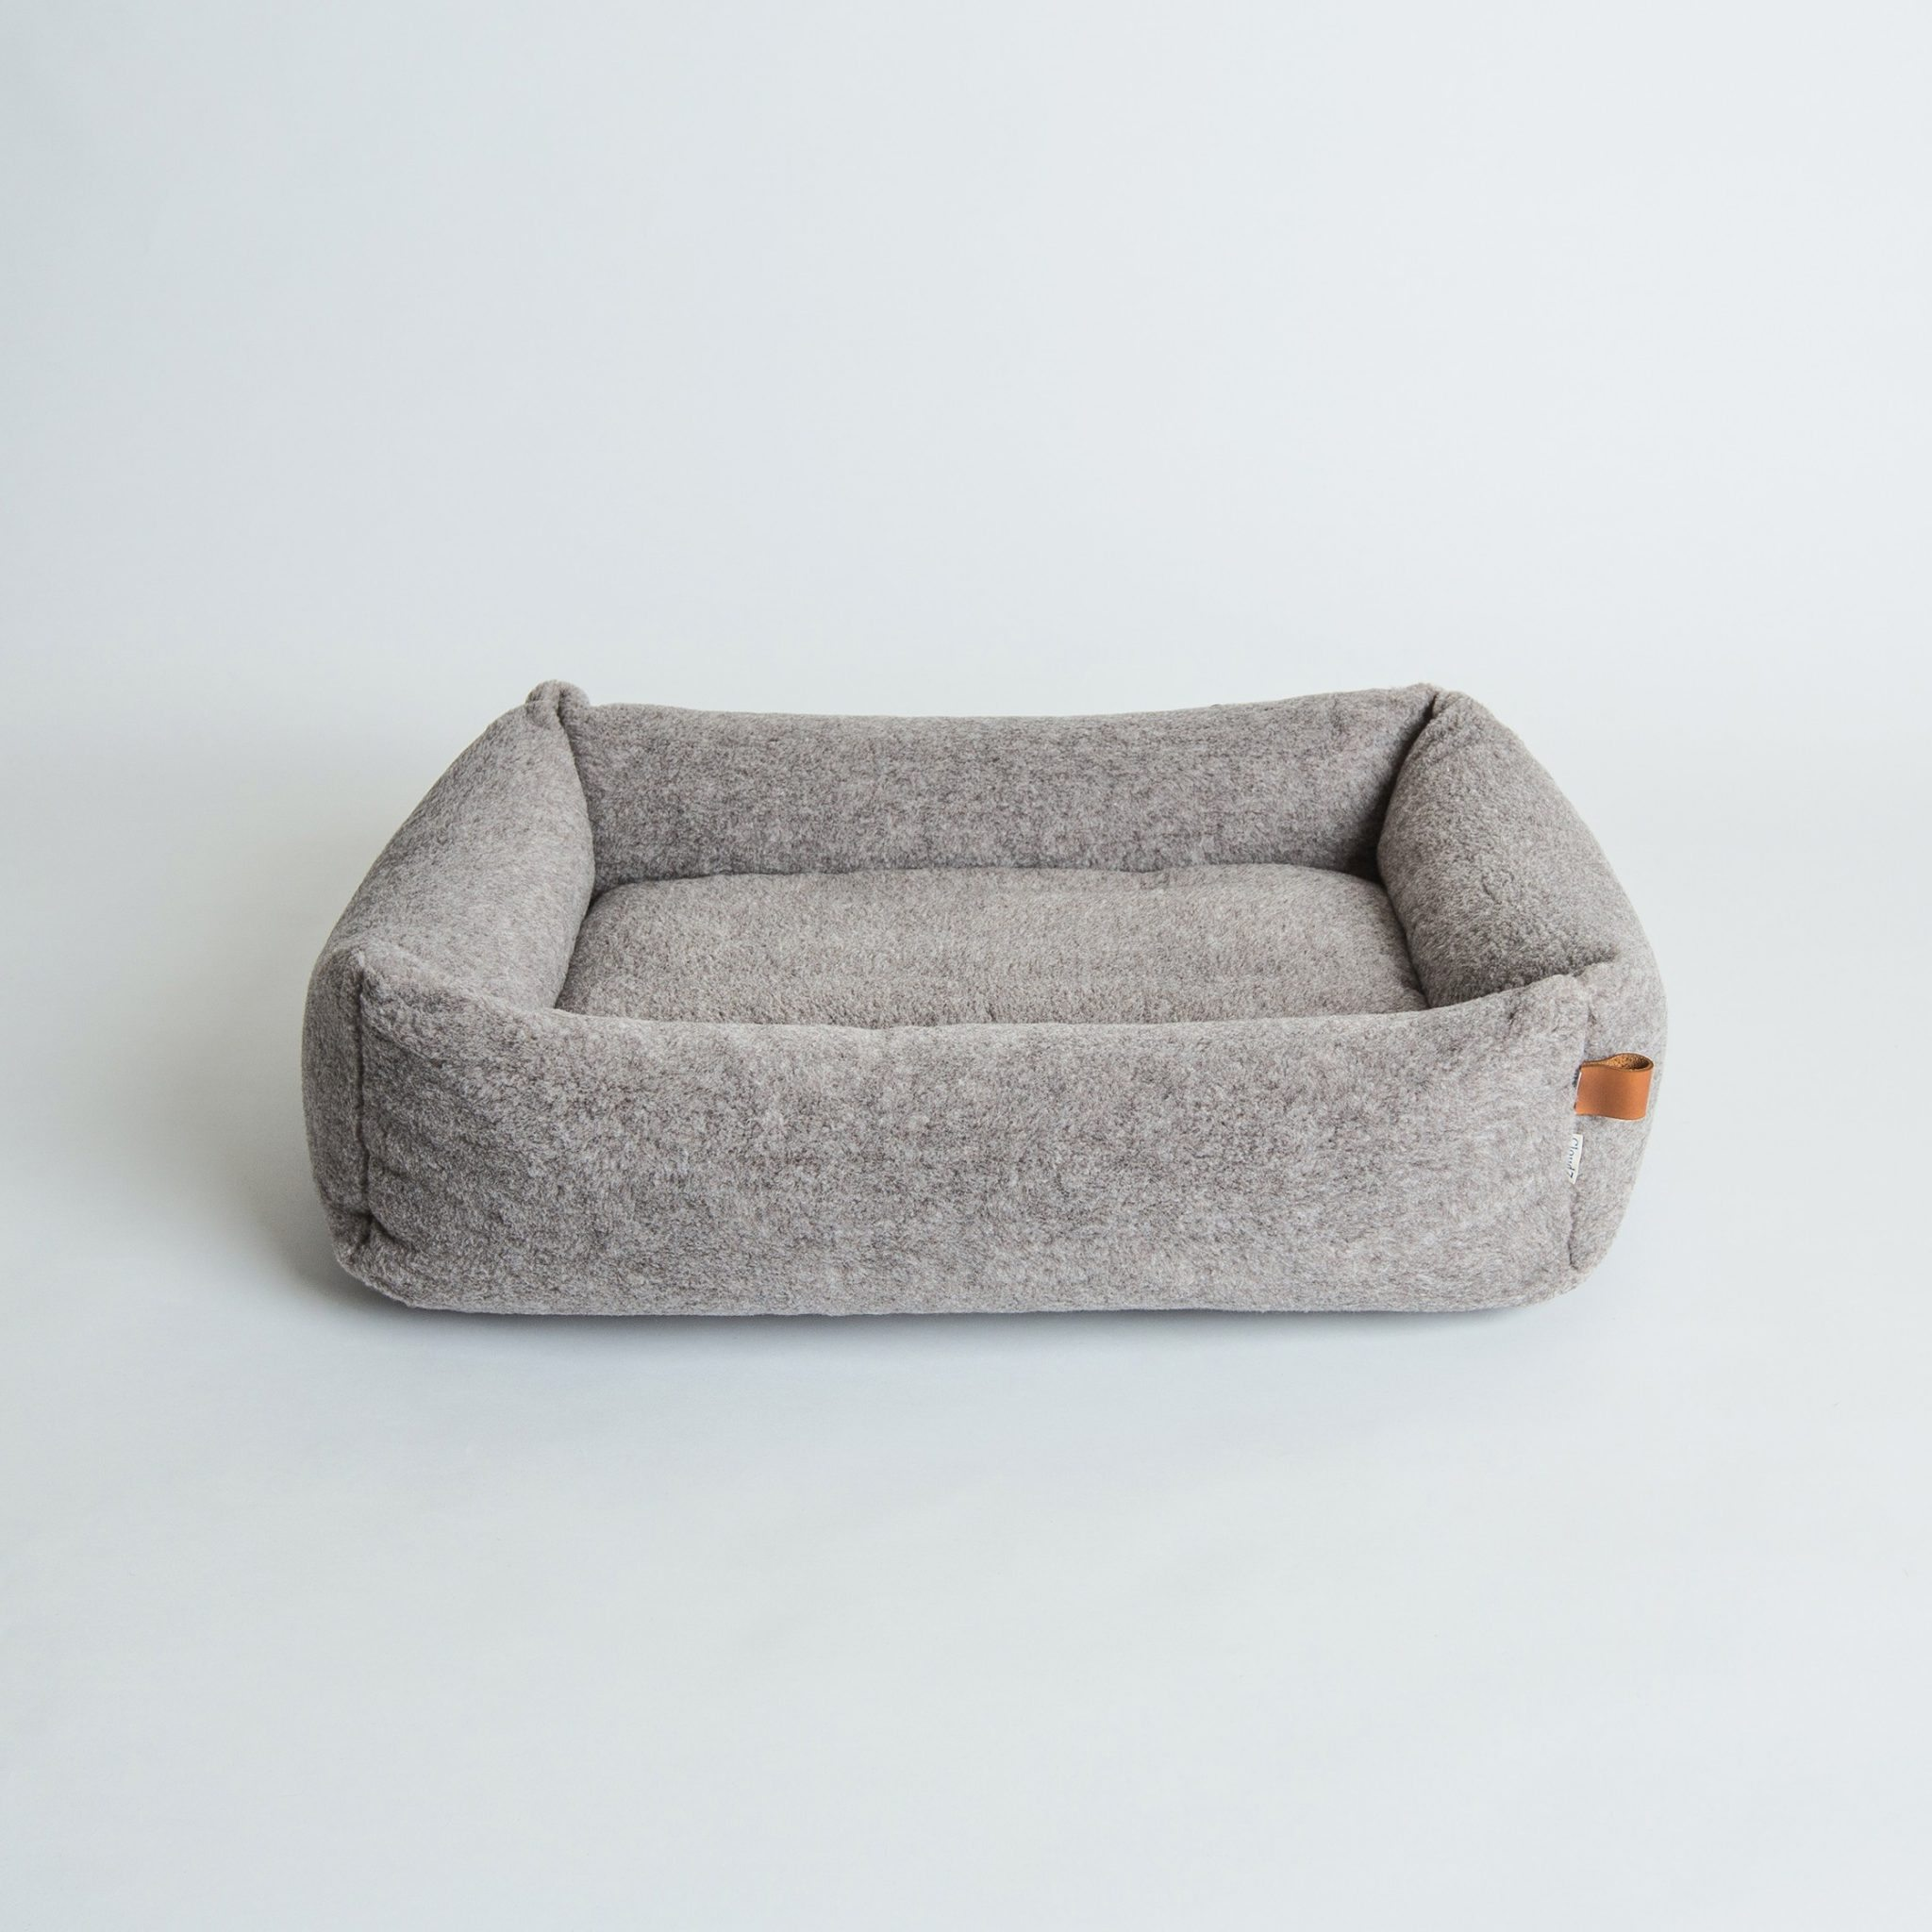 sofia products my luxury doggy bed b lov dog nero beds dsc